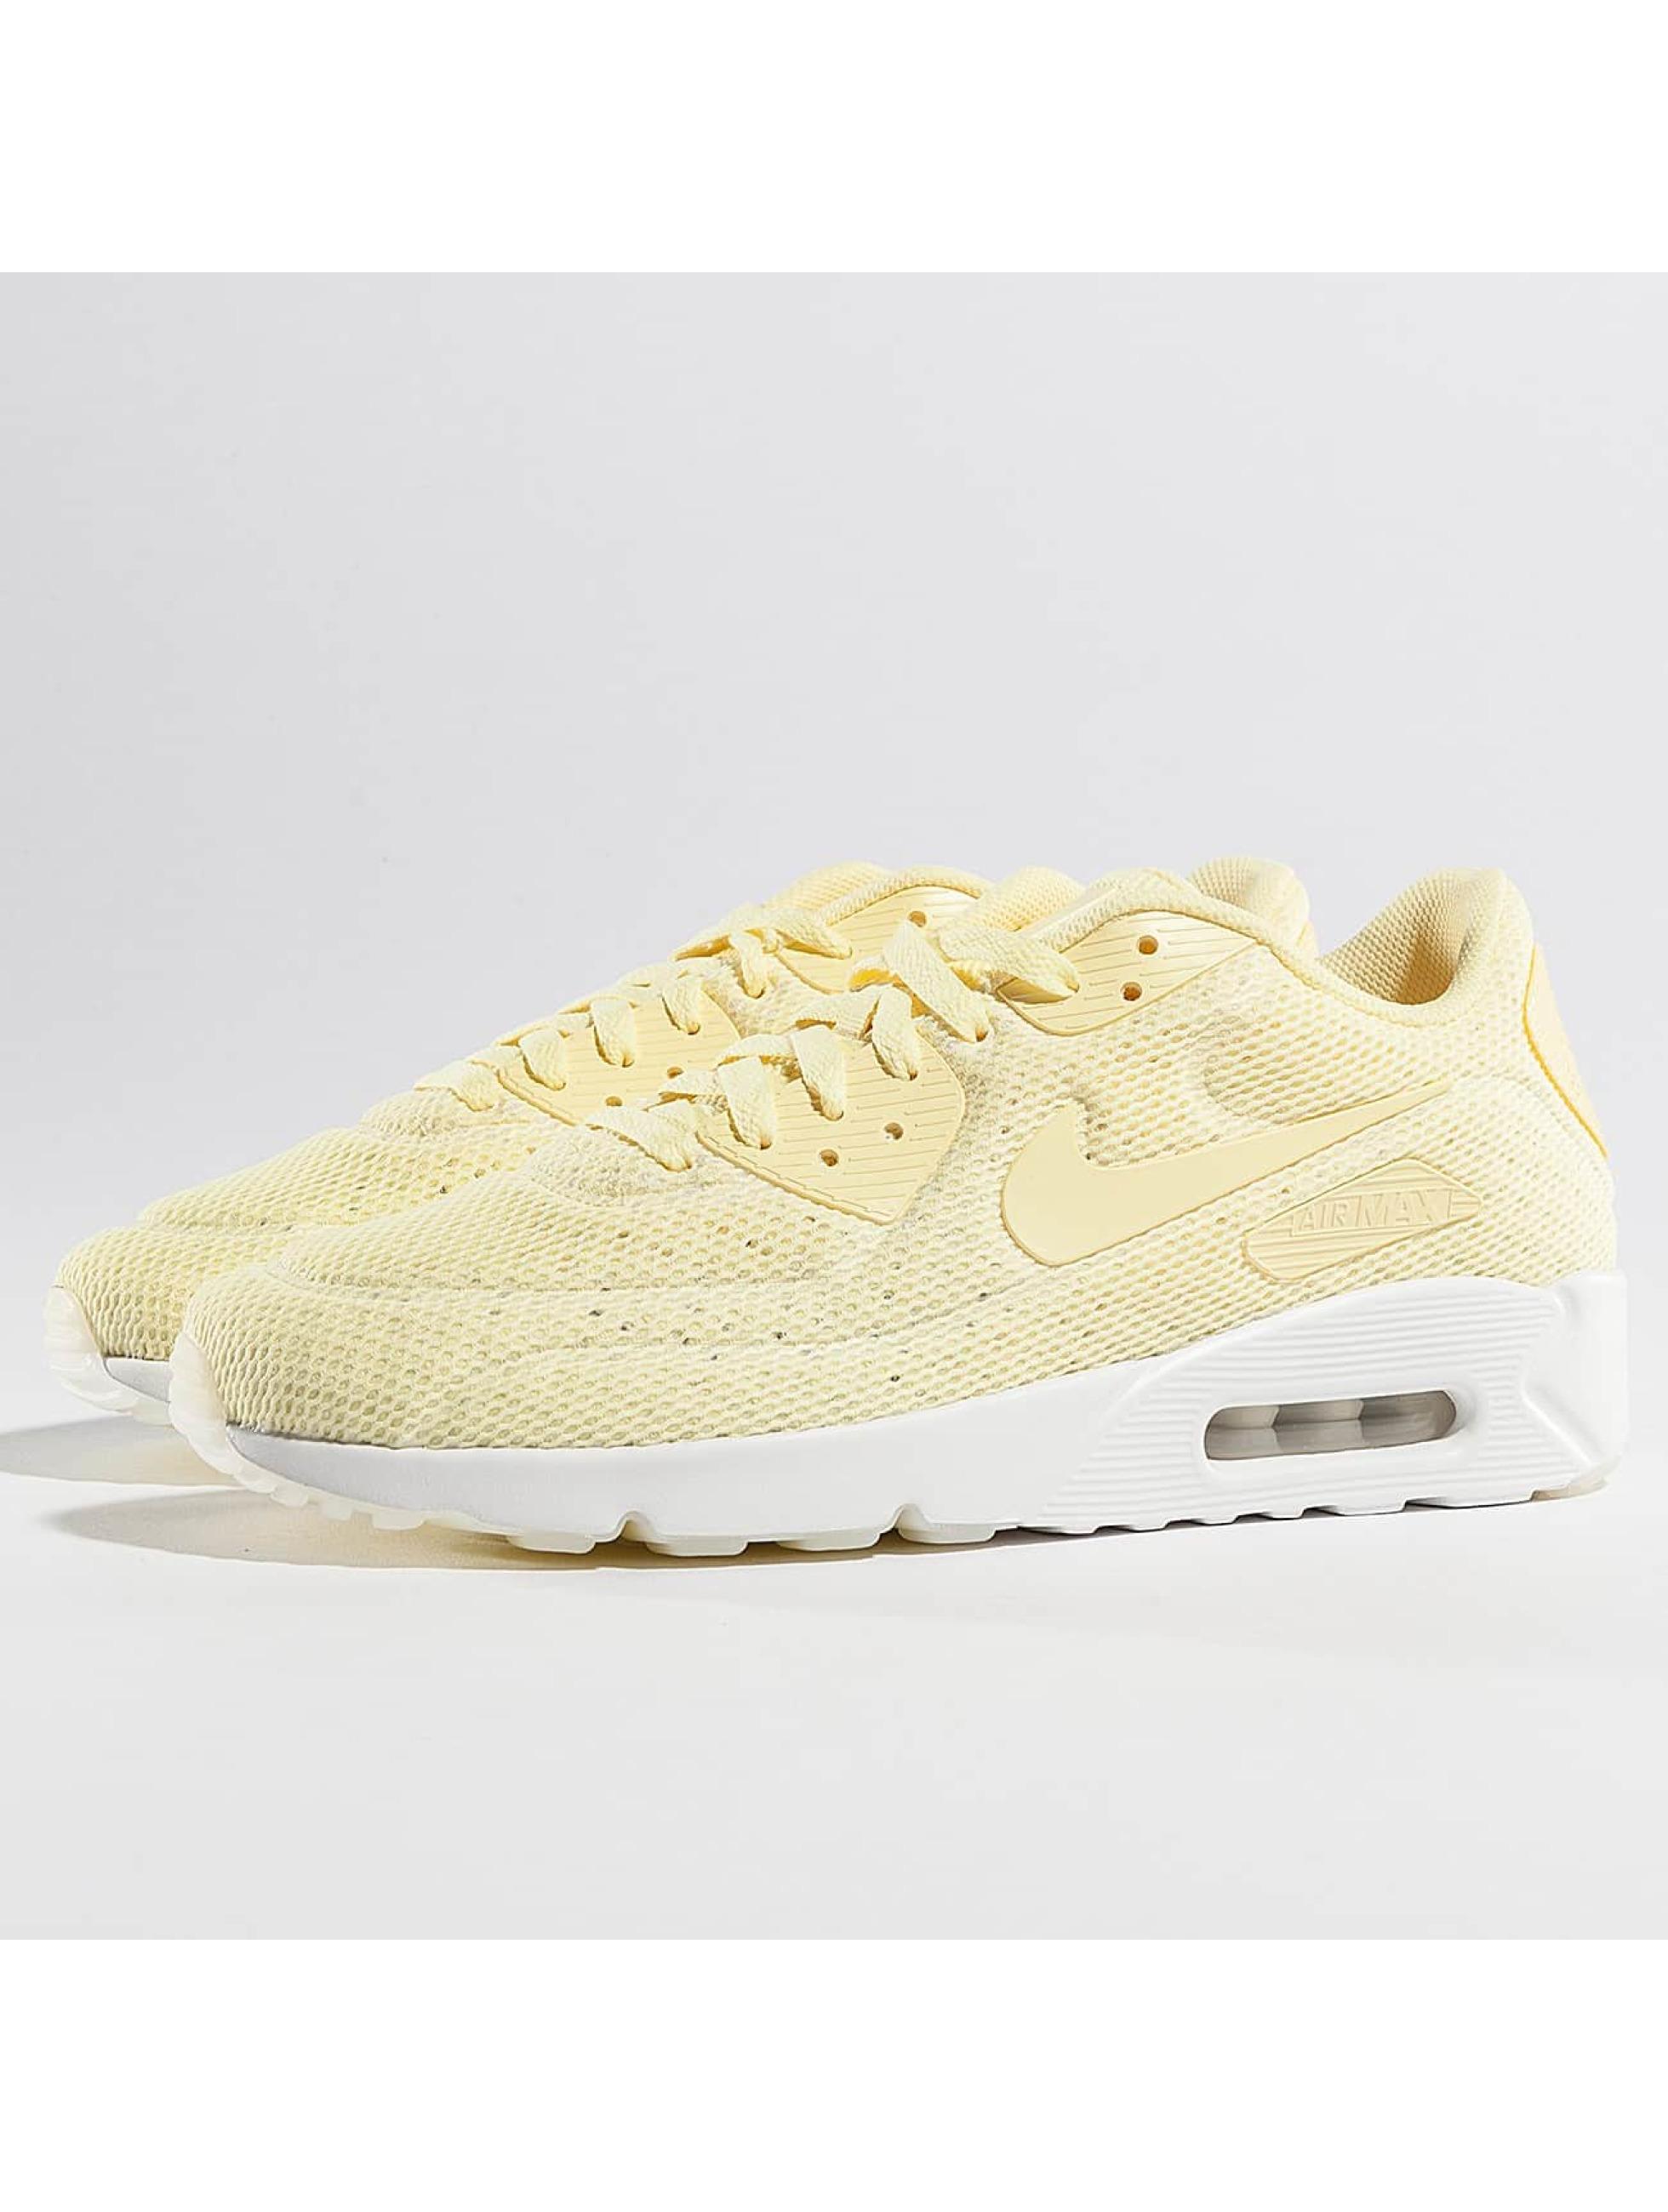 Nike Männer Sneaker Air Max 90 Ultra 2.0 BR in gelb